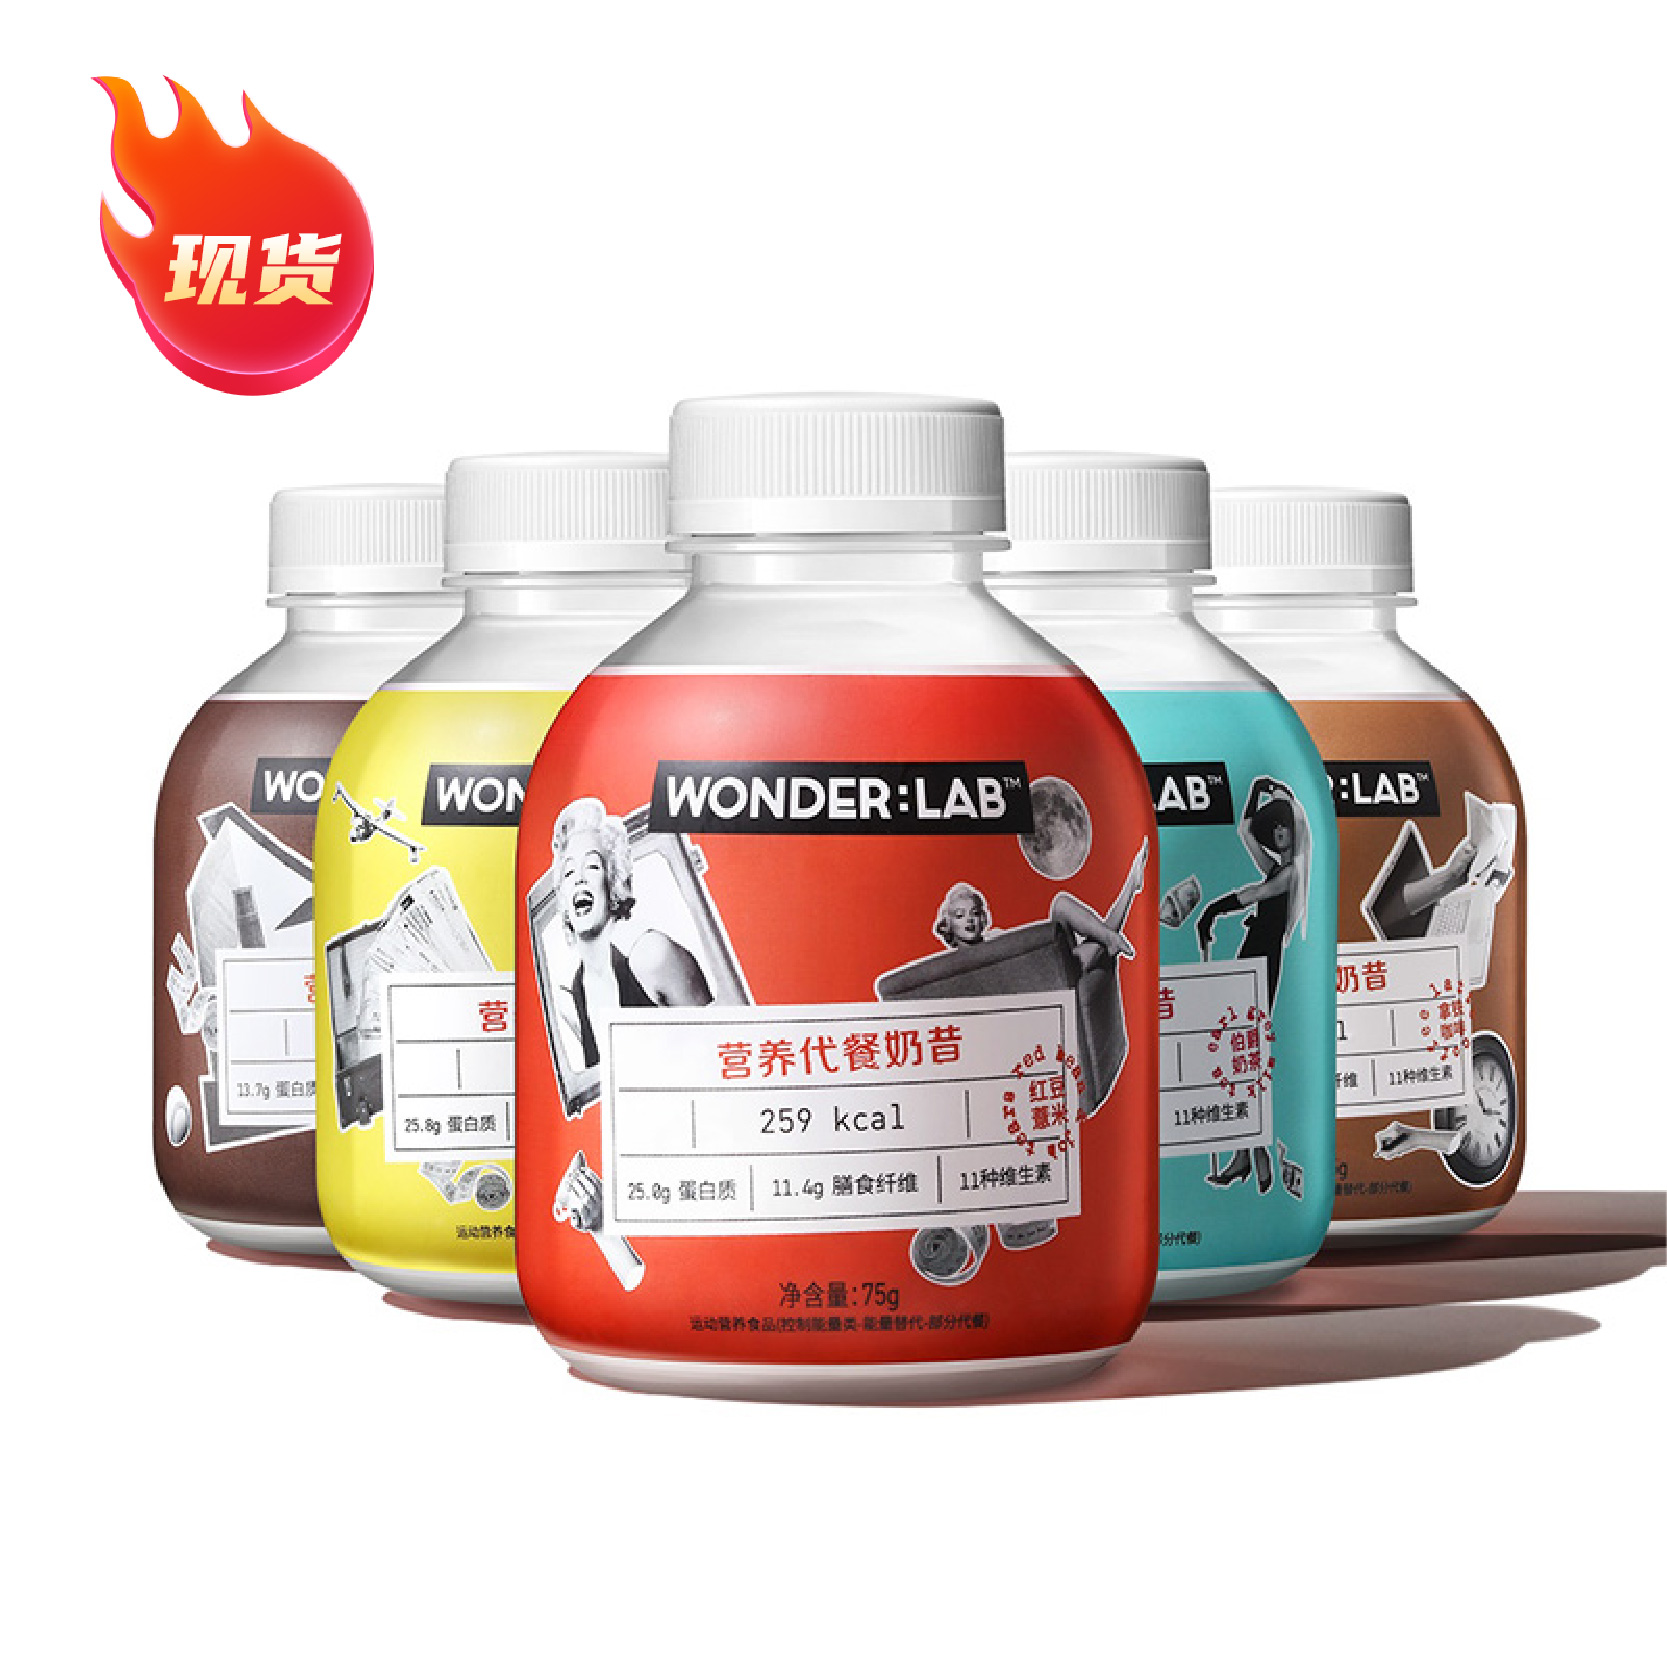 WonderLab 嚼嚼代餐奶昔|1瓶1餐|300卡超低热量|6瓶混合装